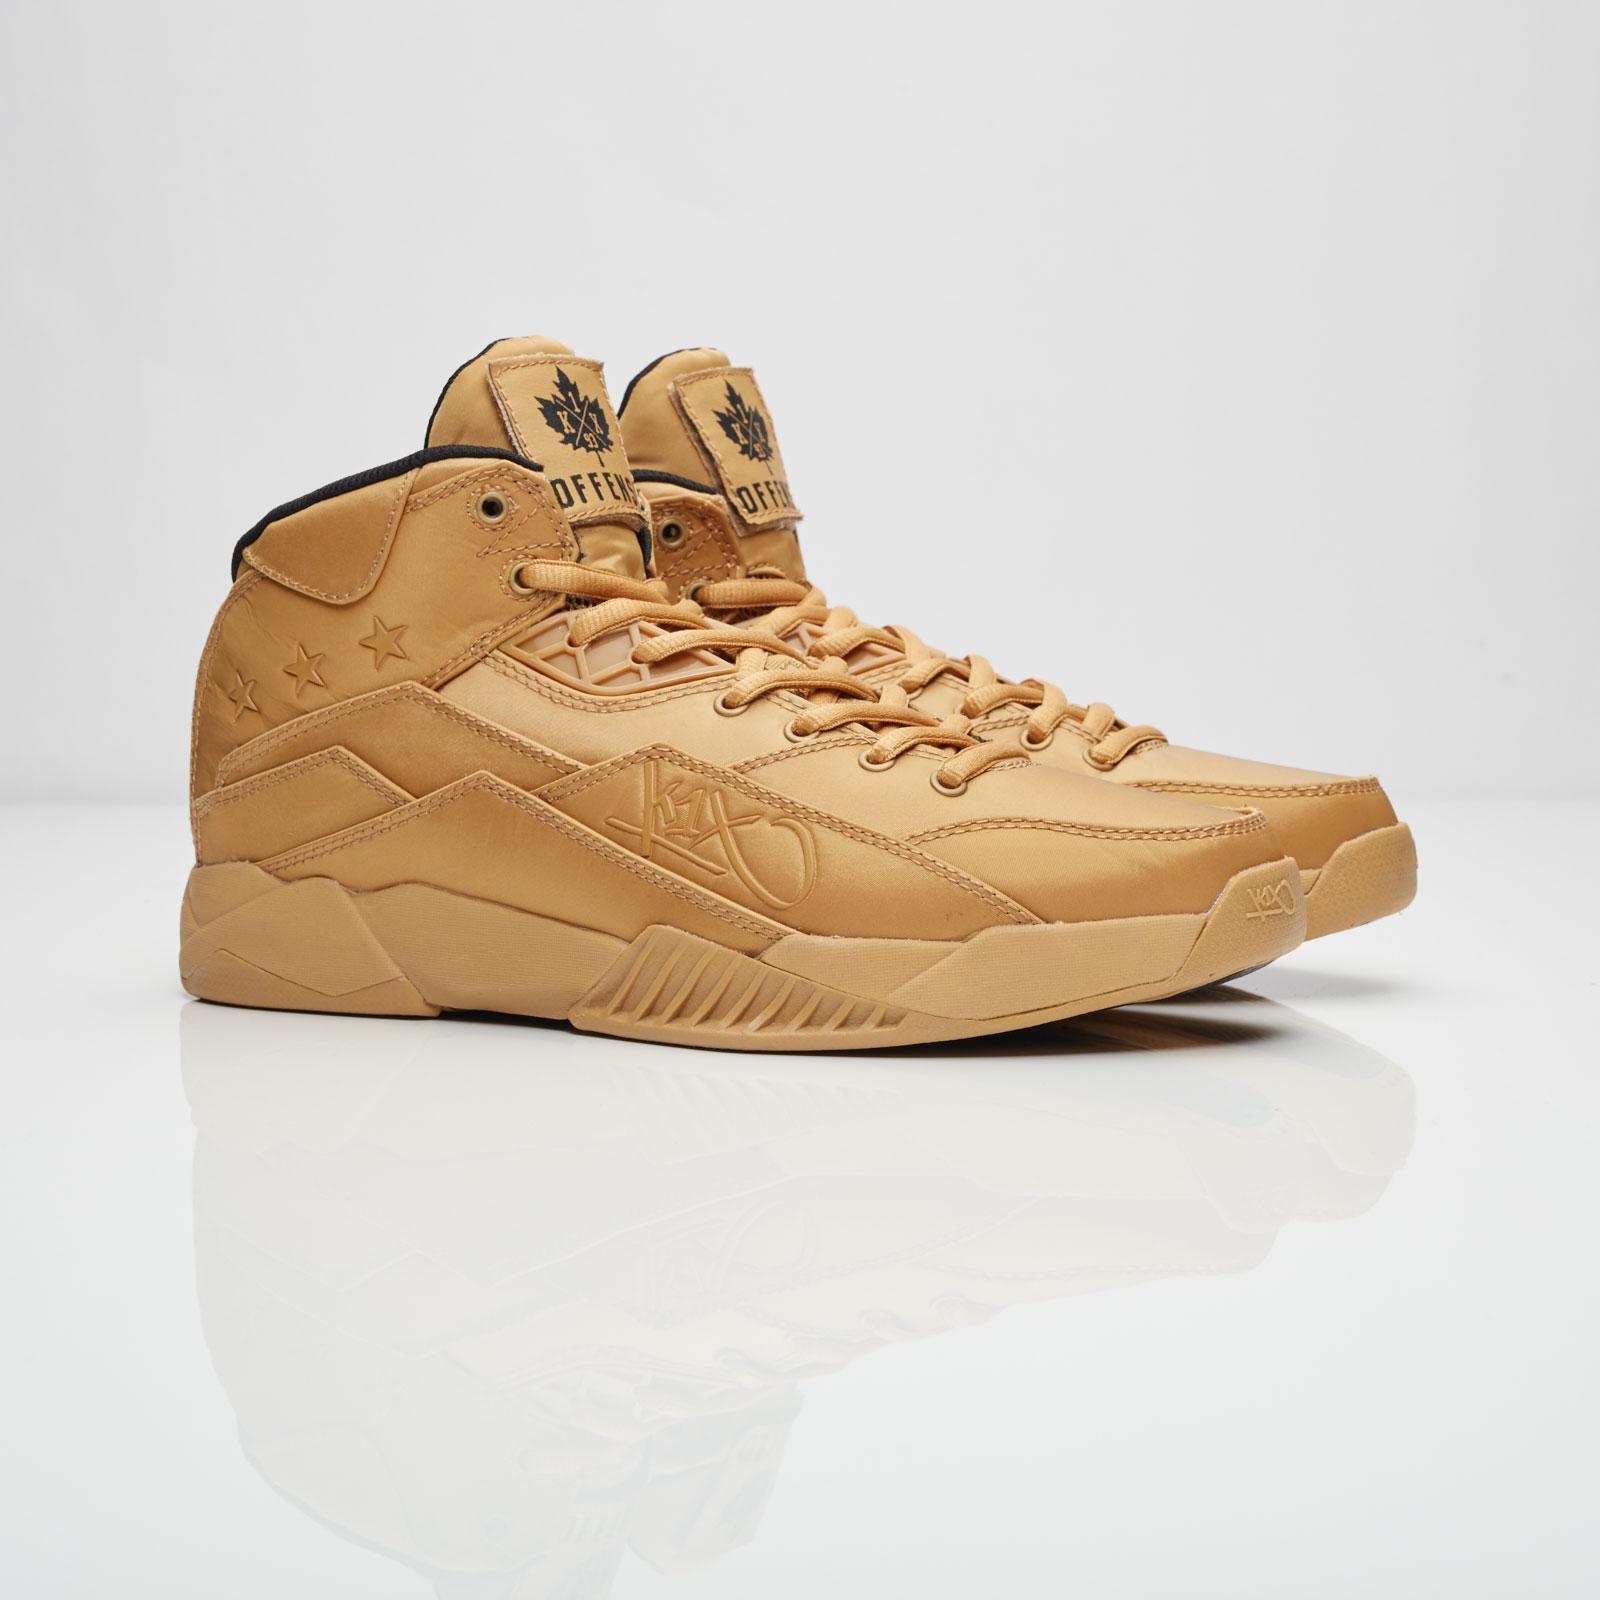 K1X Anti Gravity - 4161-0100 - Sneakersnstuff  93984555e1e1